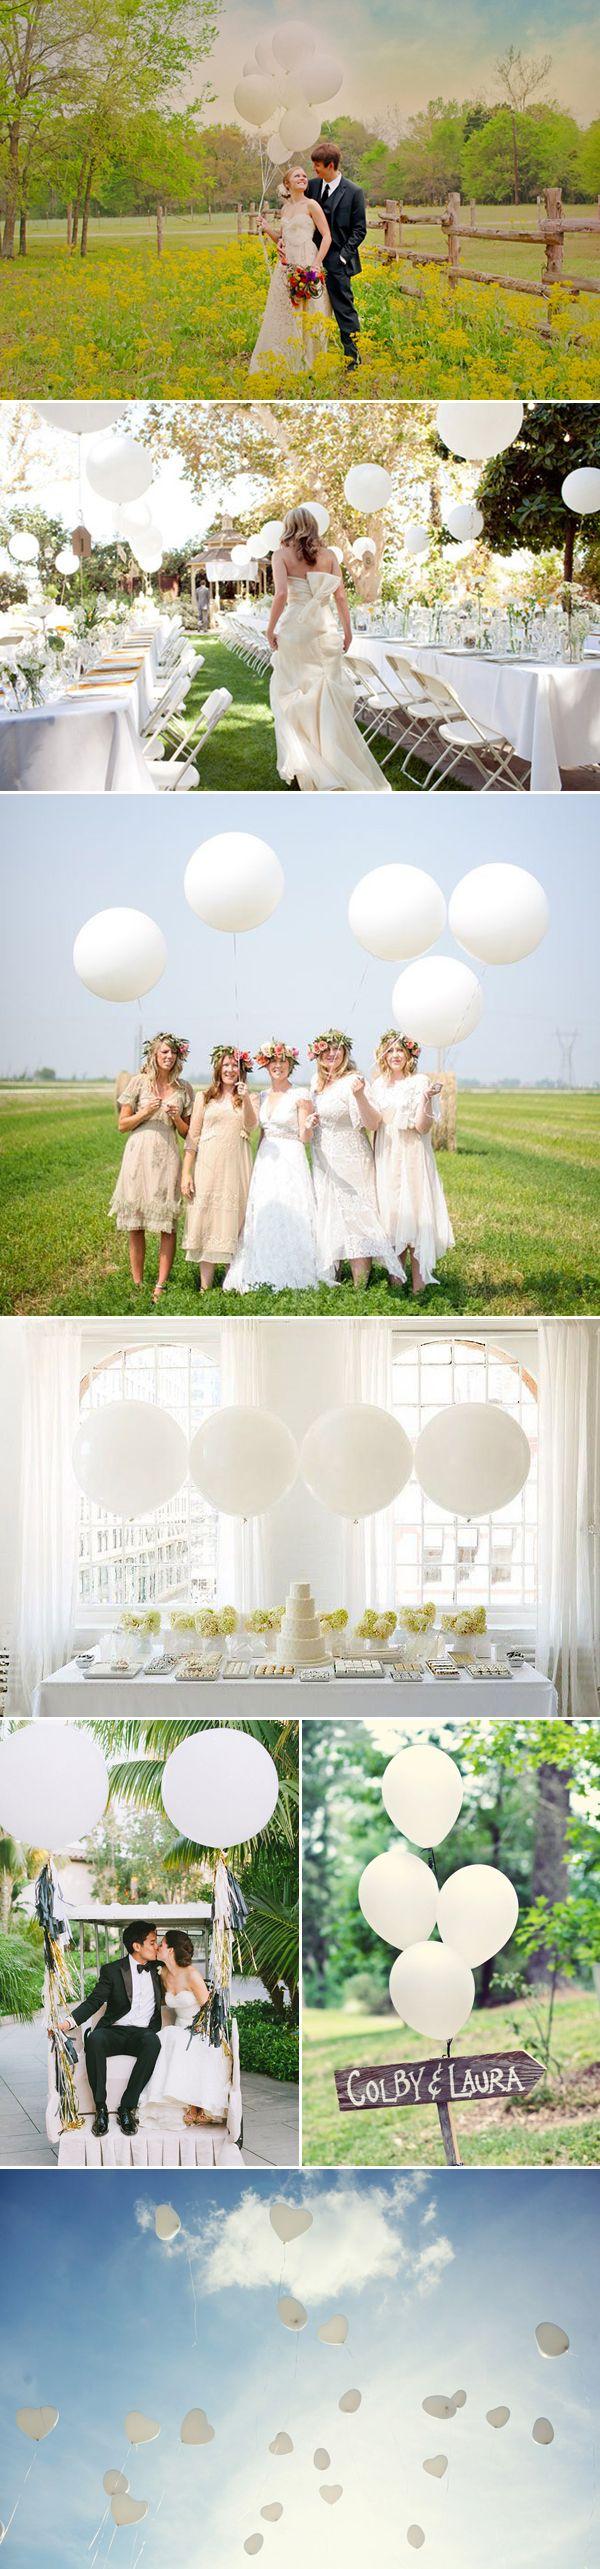 Stijlvol witte ballonnen, Goedkope versiering: ballonnen - Girls of honour